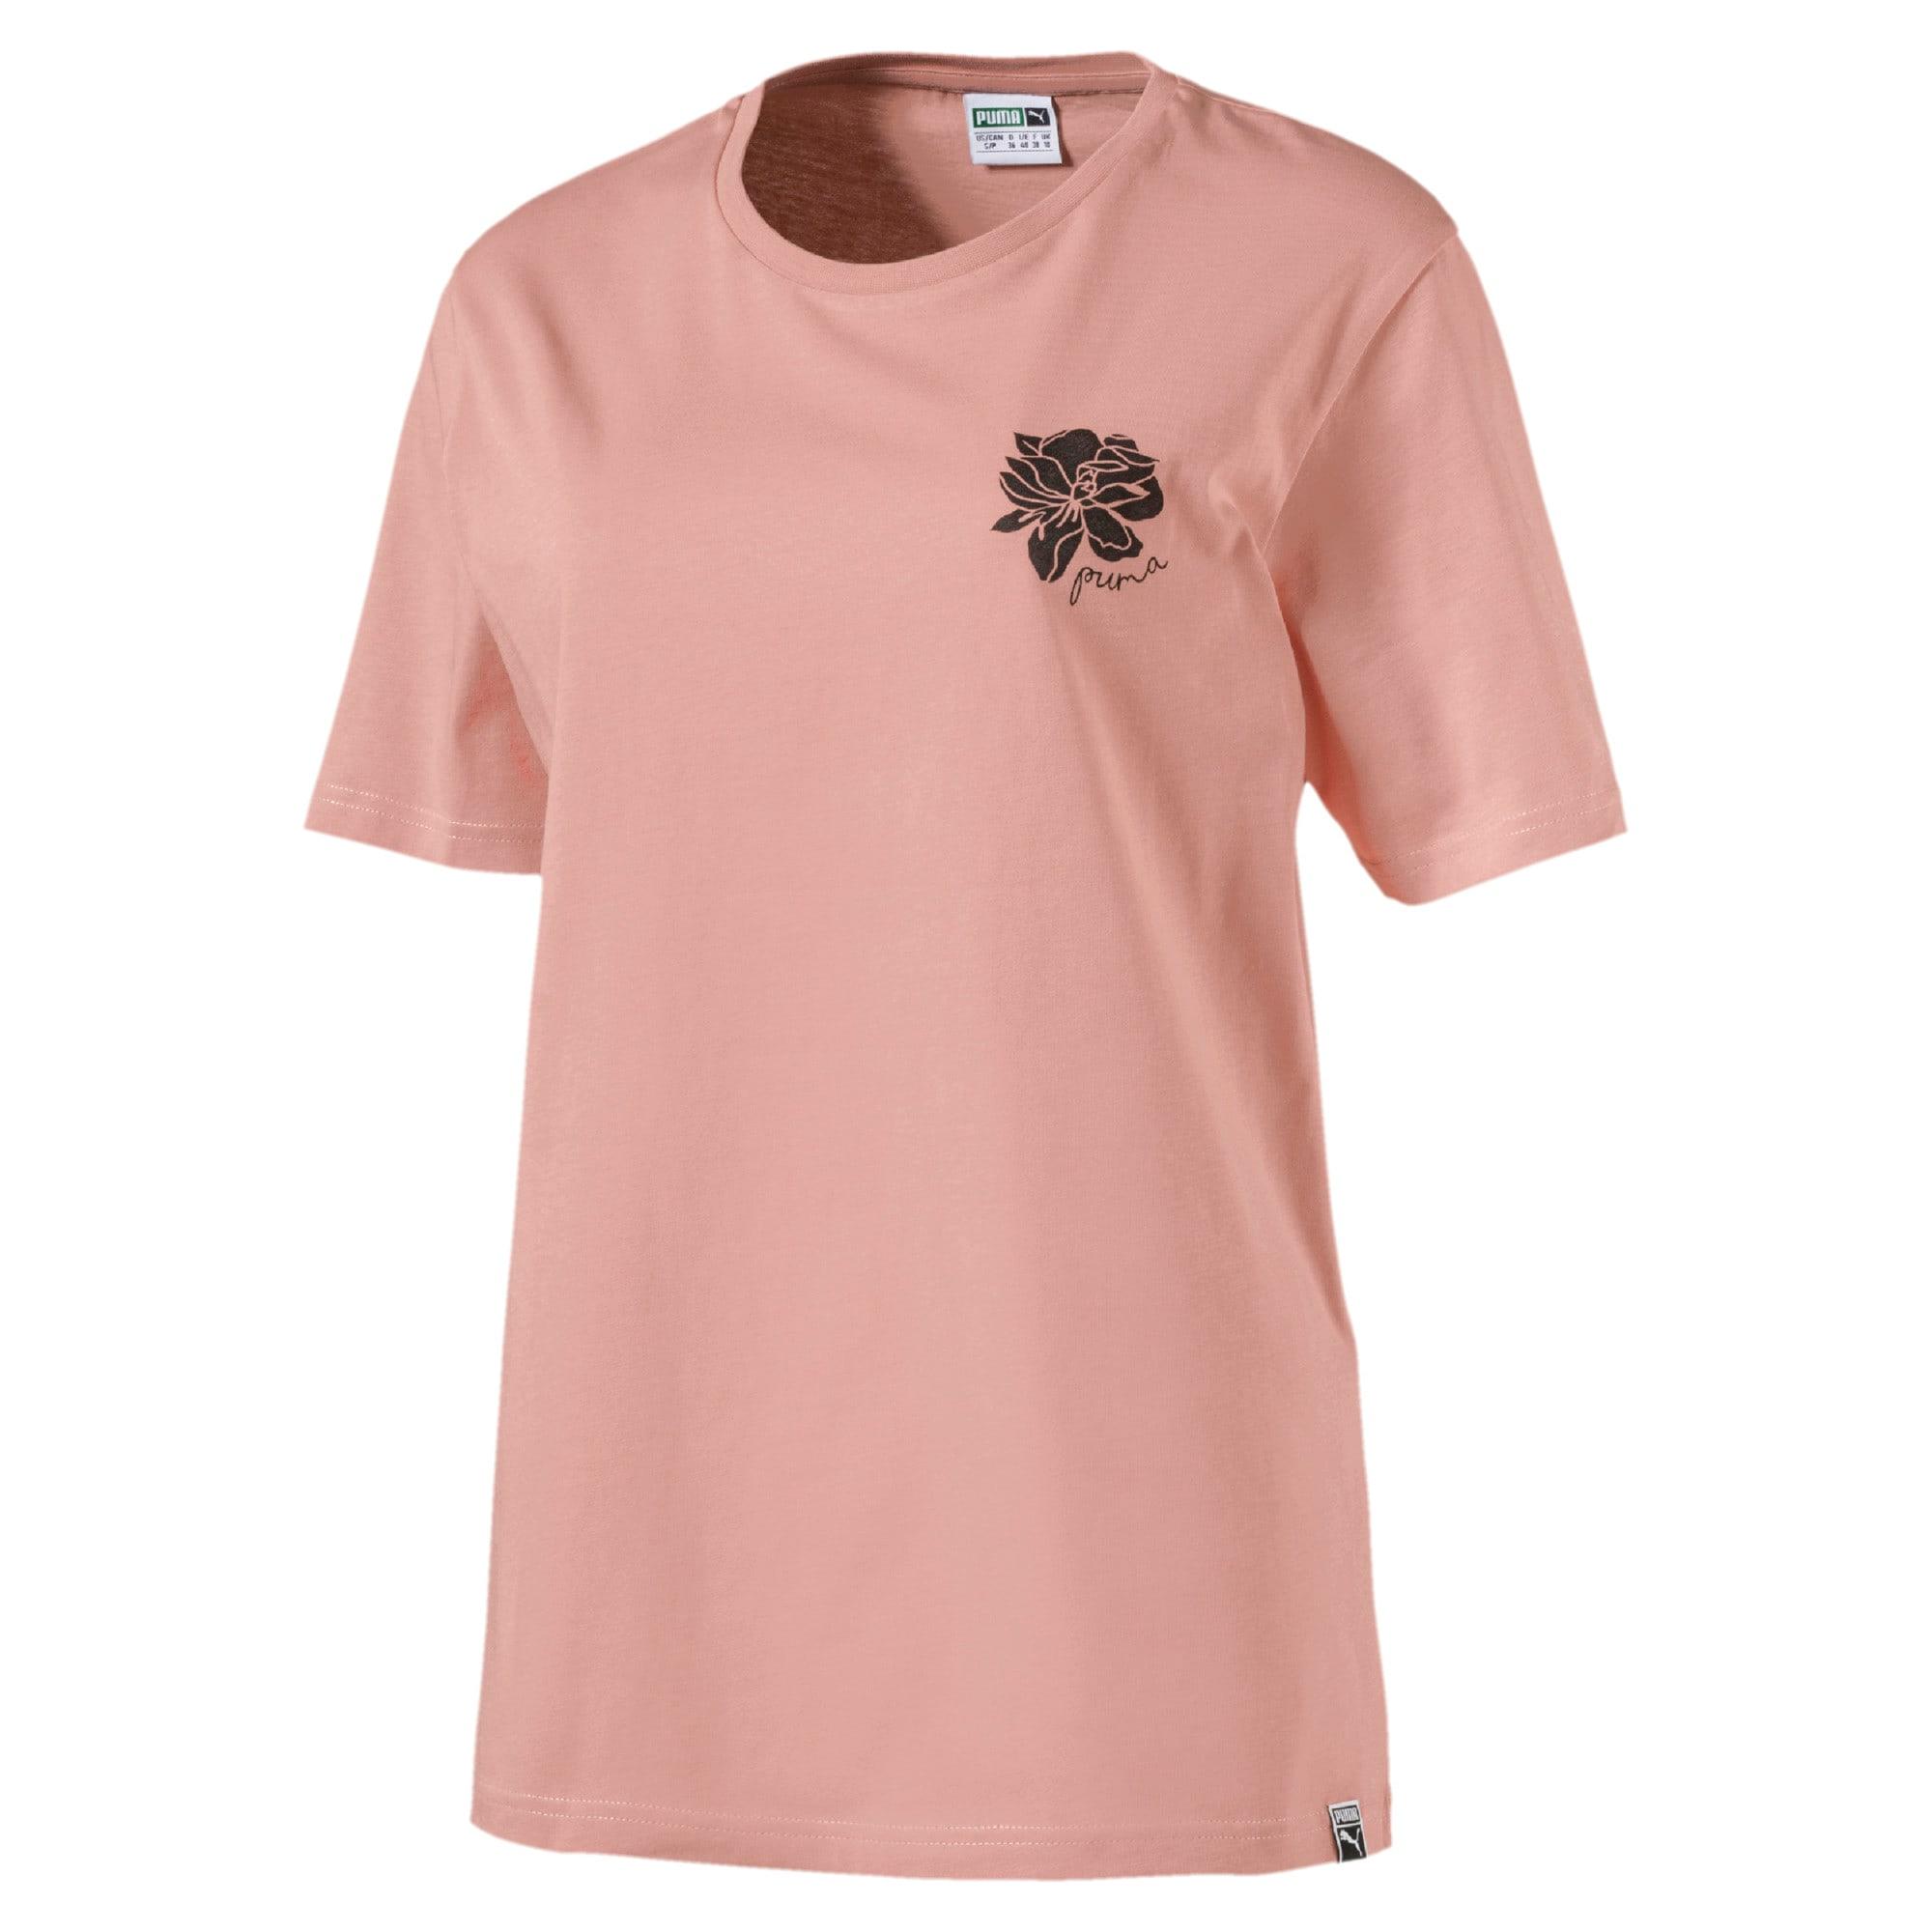 Thumbnail 1 of Women's Graphic T-shirt, Peach Beige, medium-IND